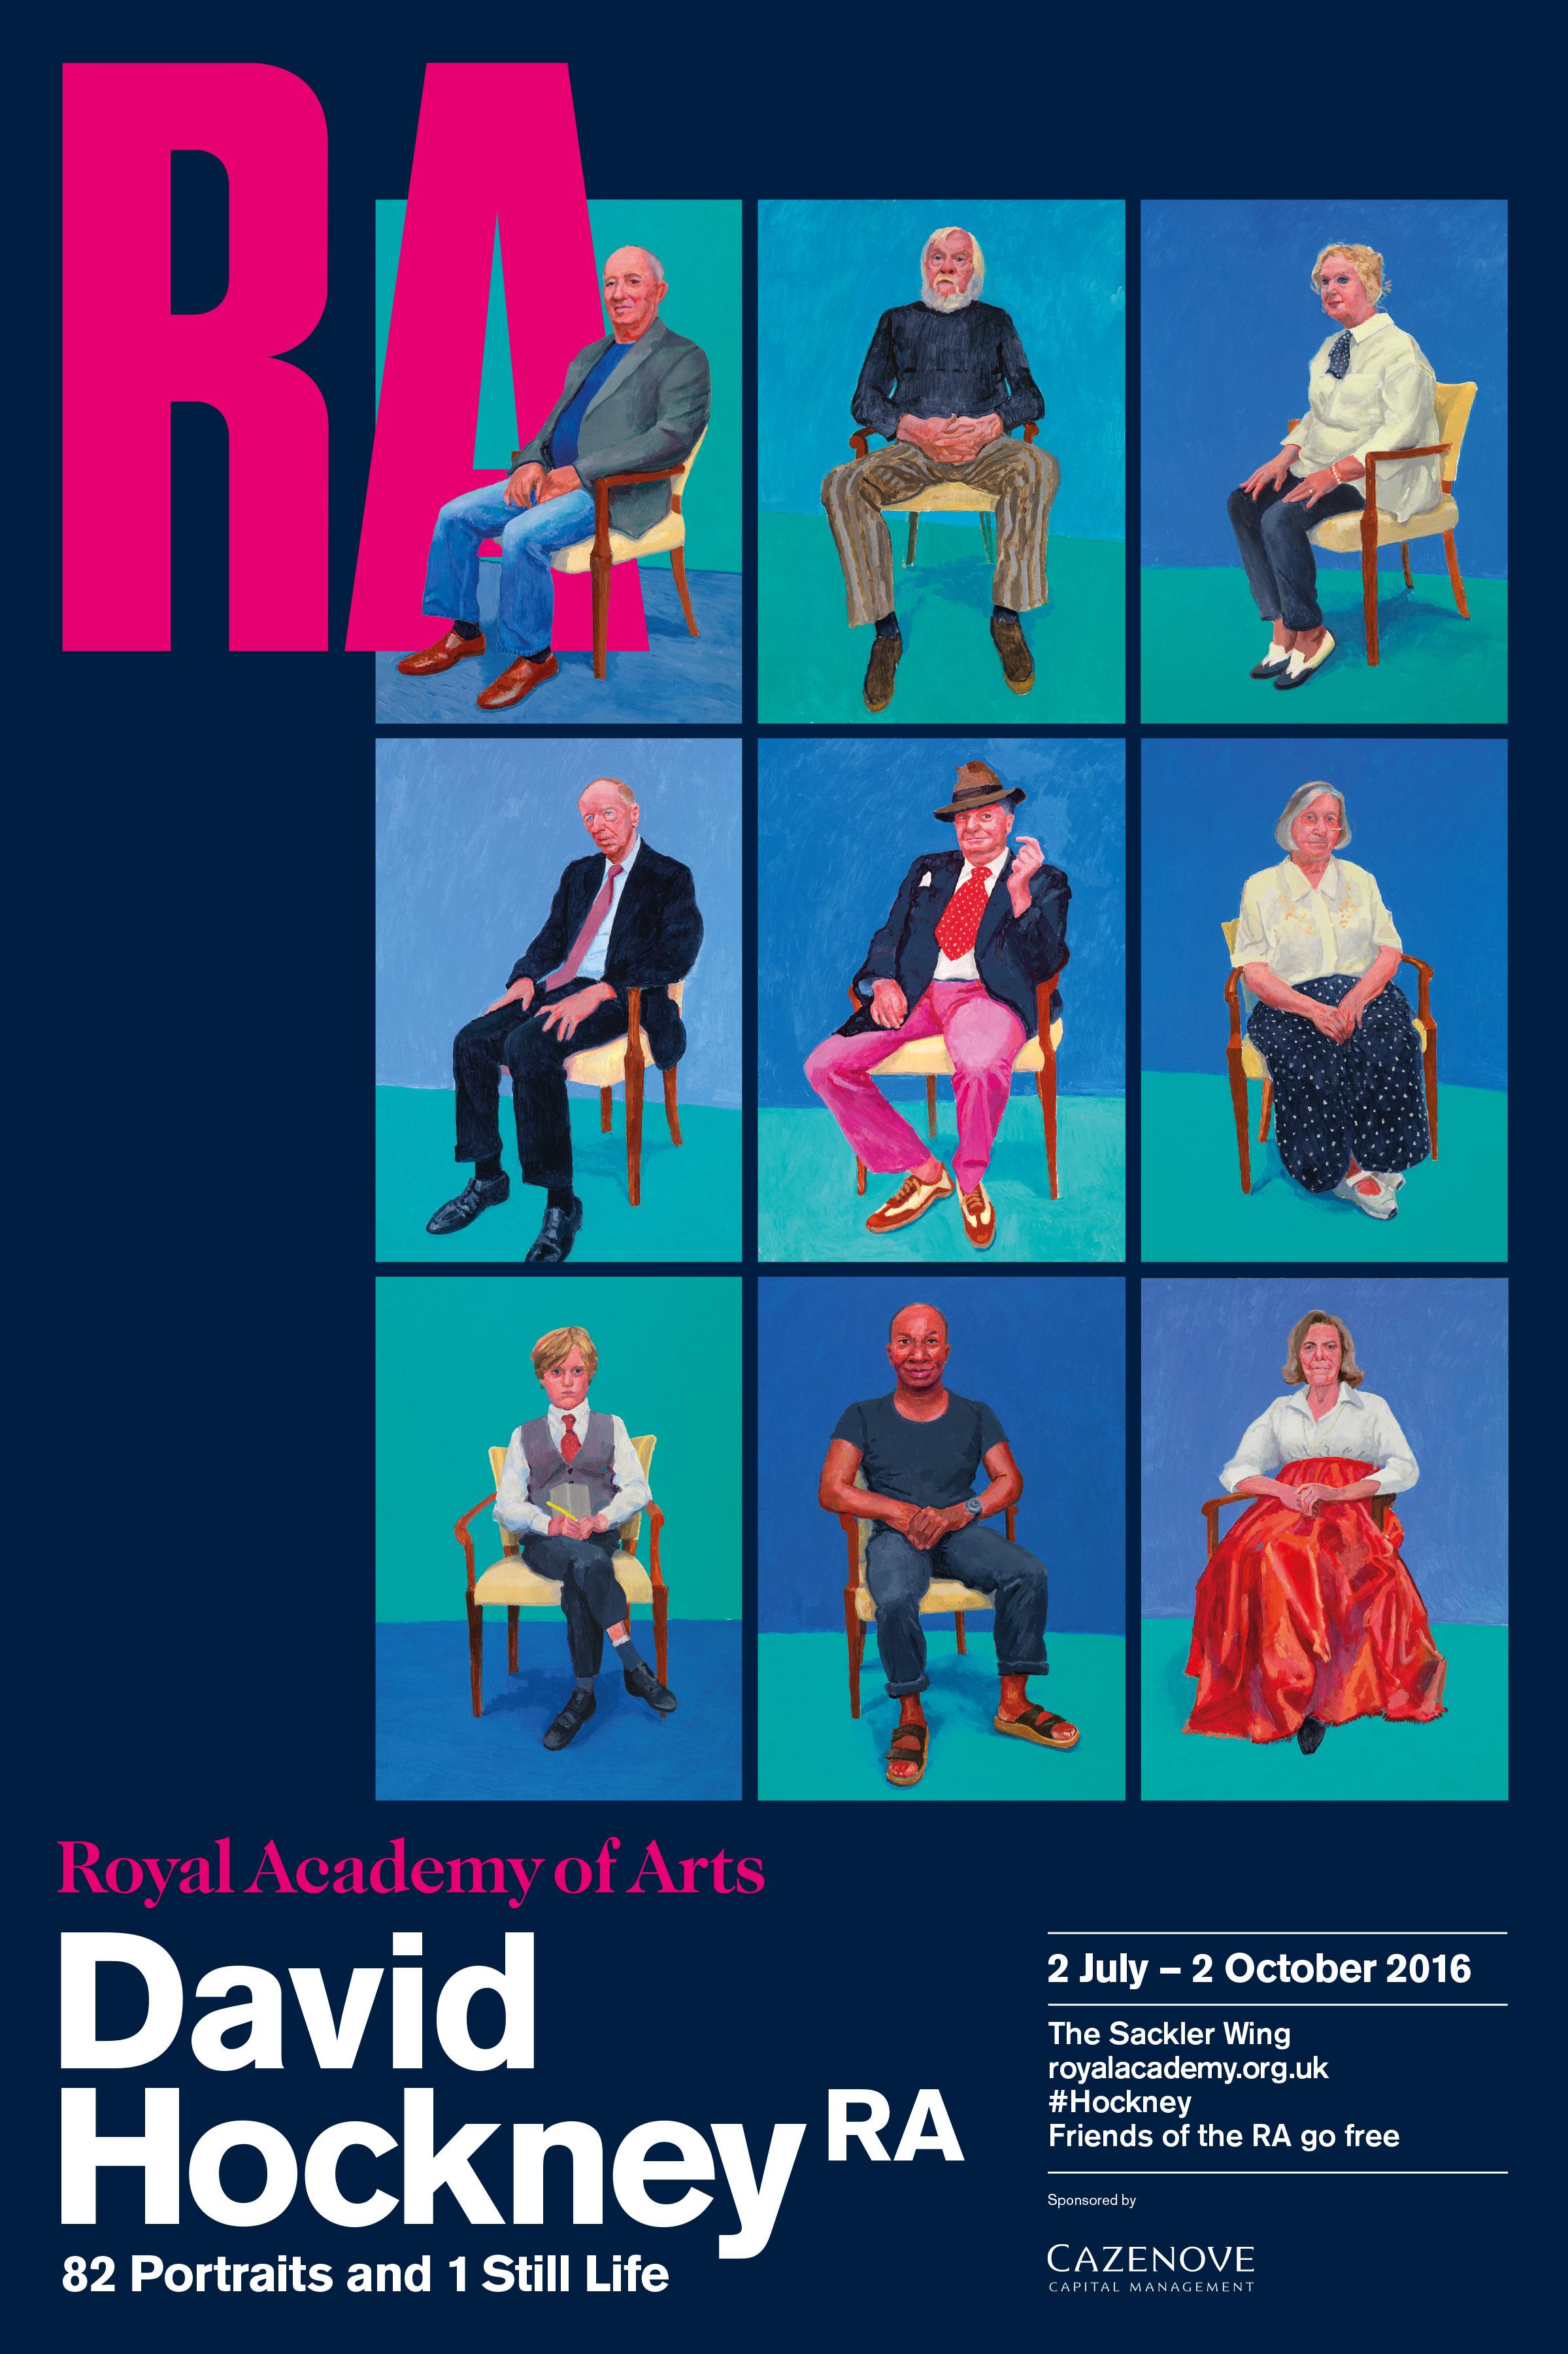 RA David Hockney 2016 4&16 sheet AW HR